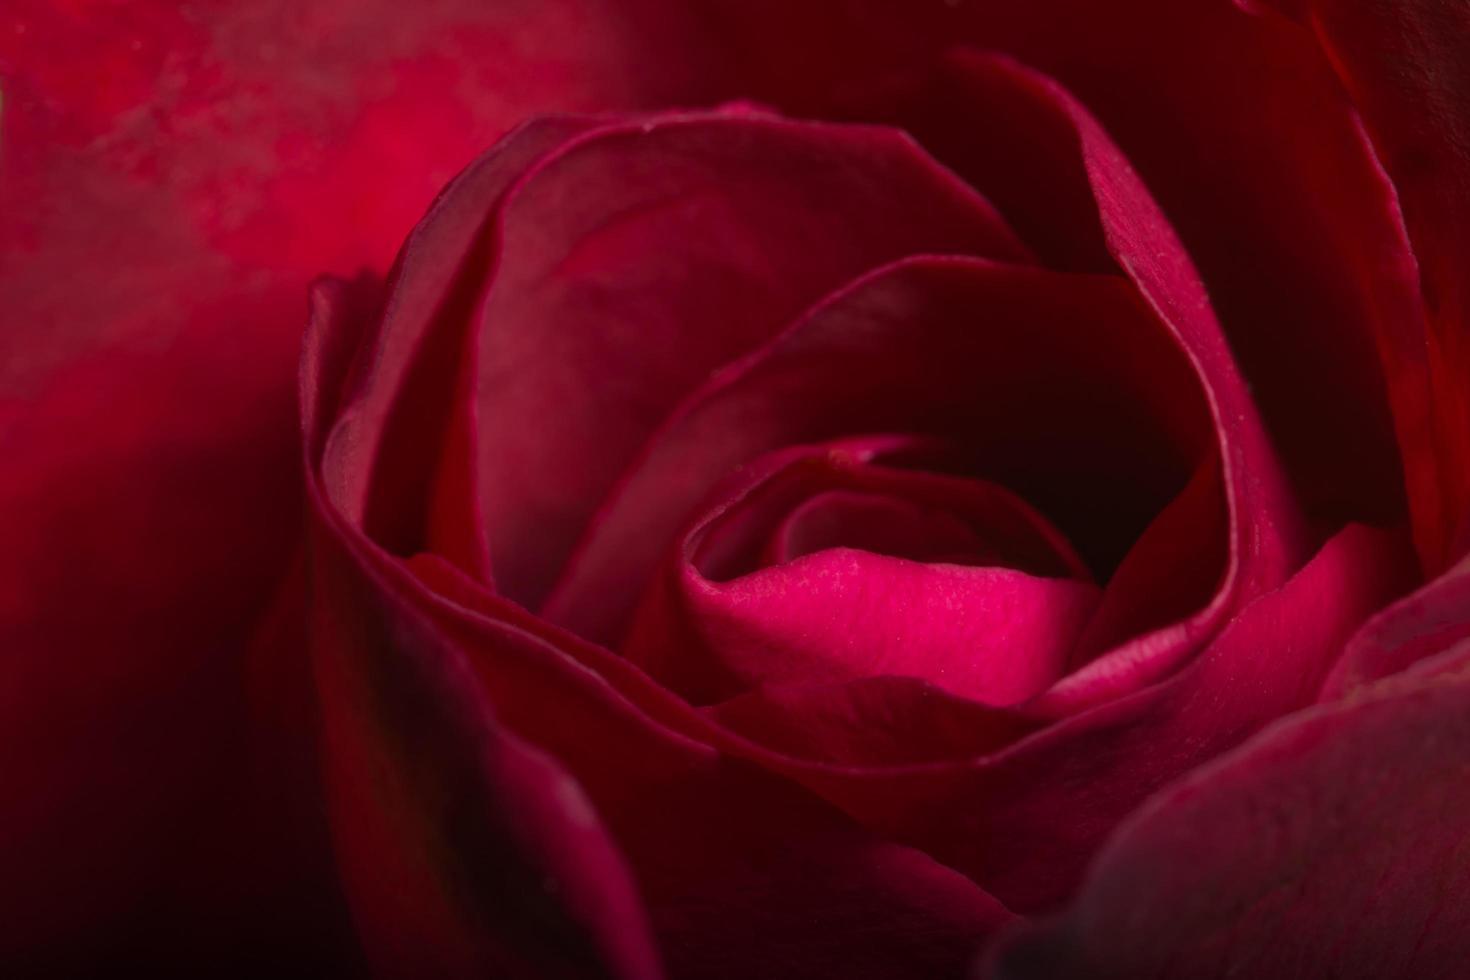 primo piano belle rose rosse foto